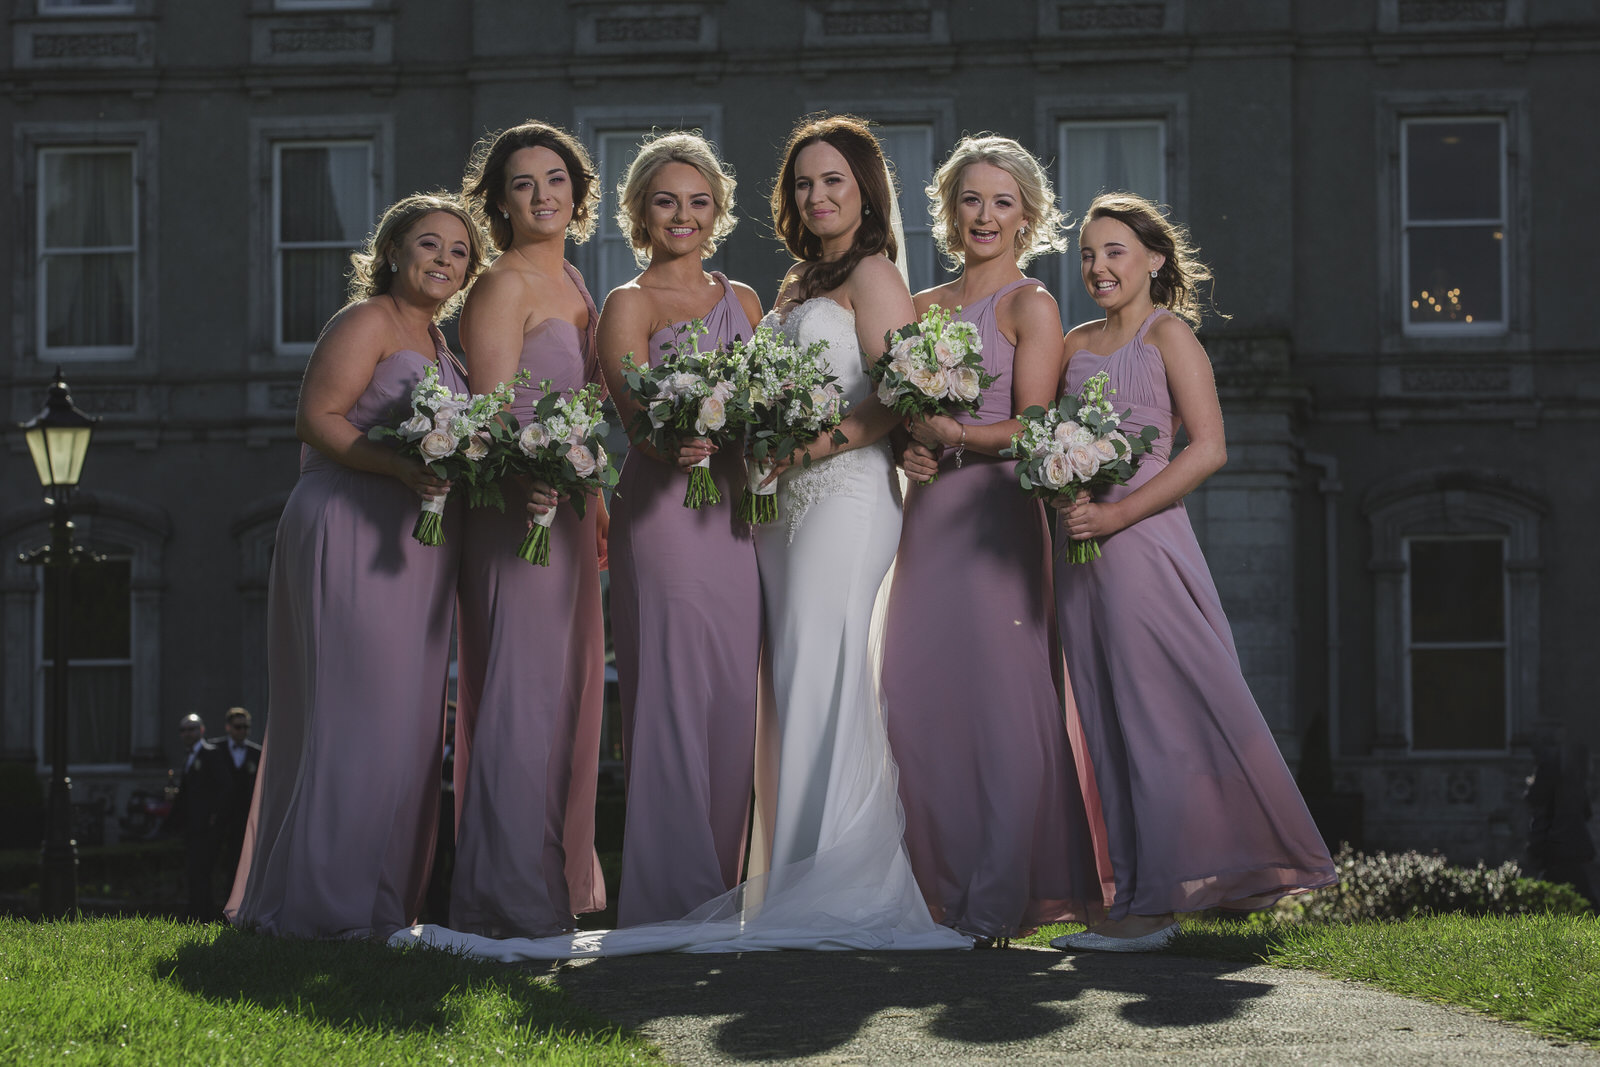 waterford_faithlegg_wedding_photographer_goldenmonentsweddingphotography_a529.jpg